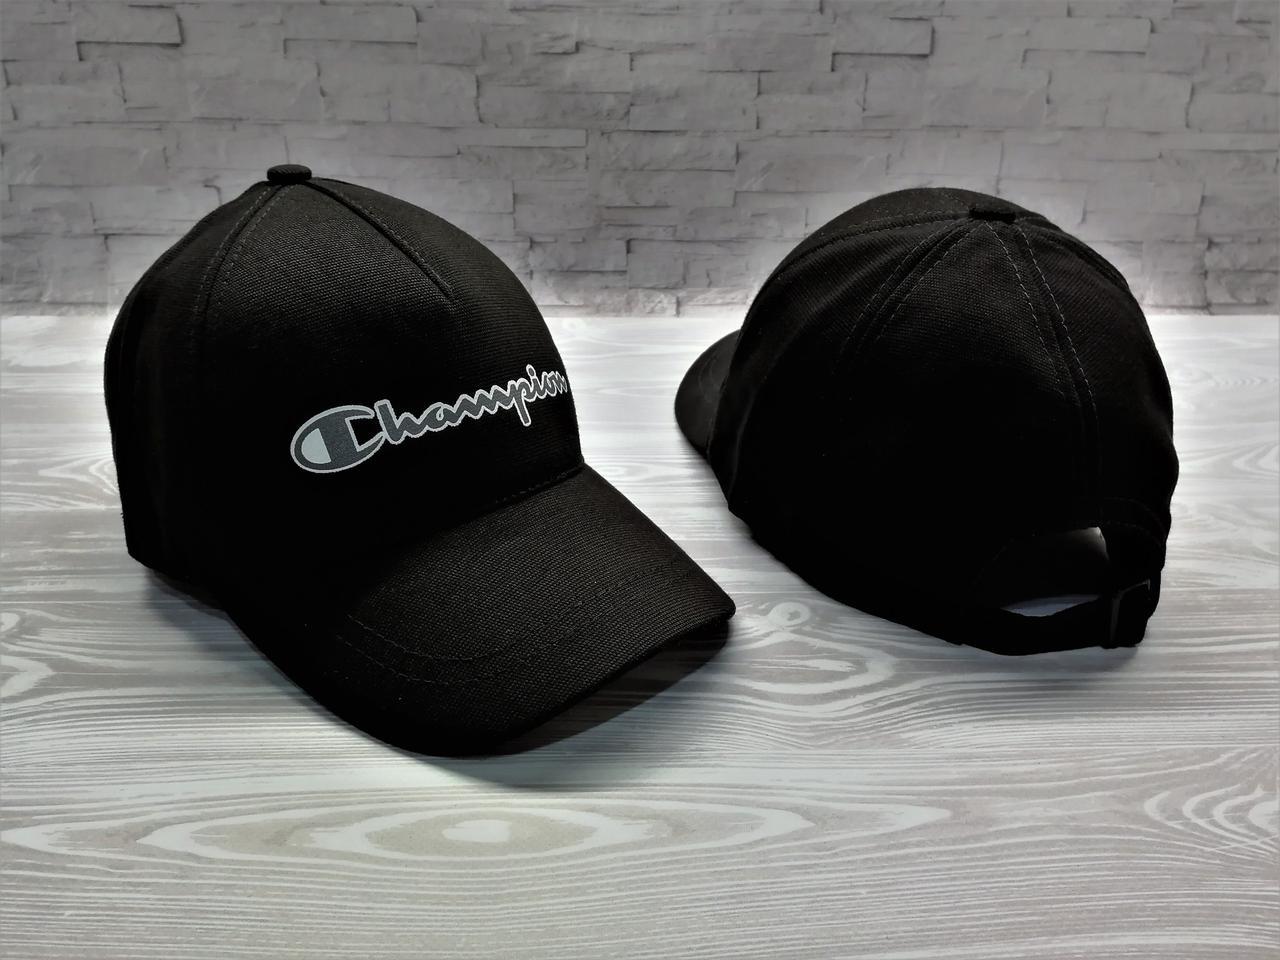 Кепка бейсболка блайзер Champion черная  продажа 36a83d8ba4ebd